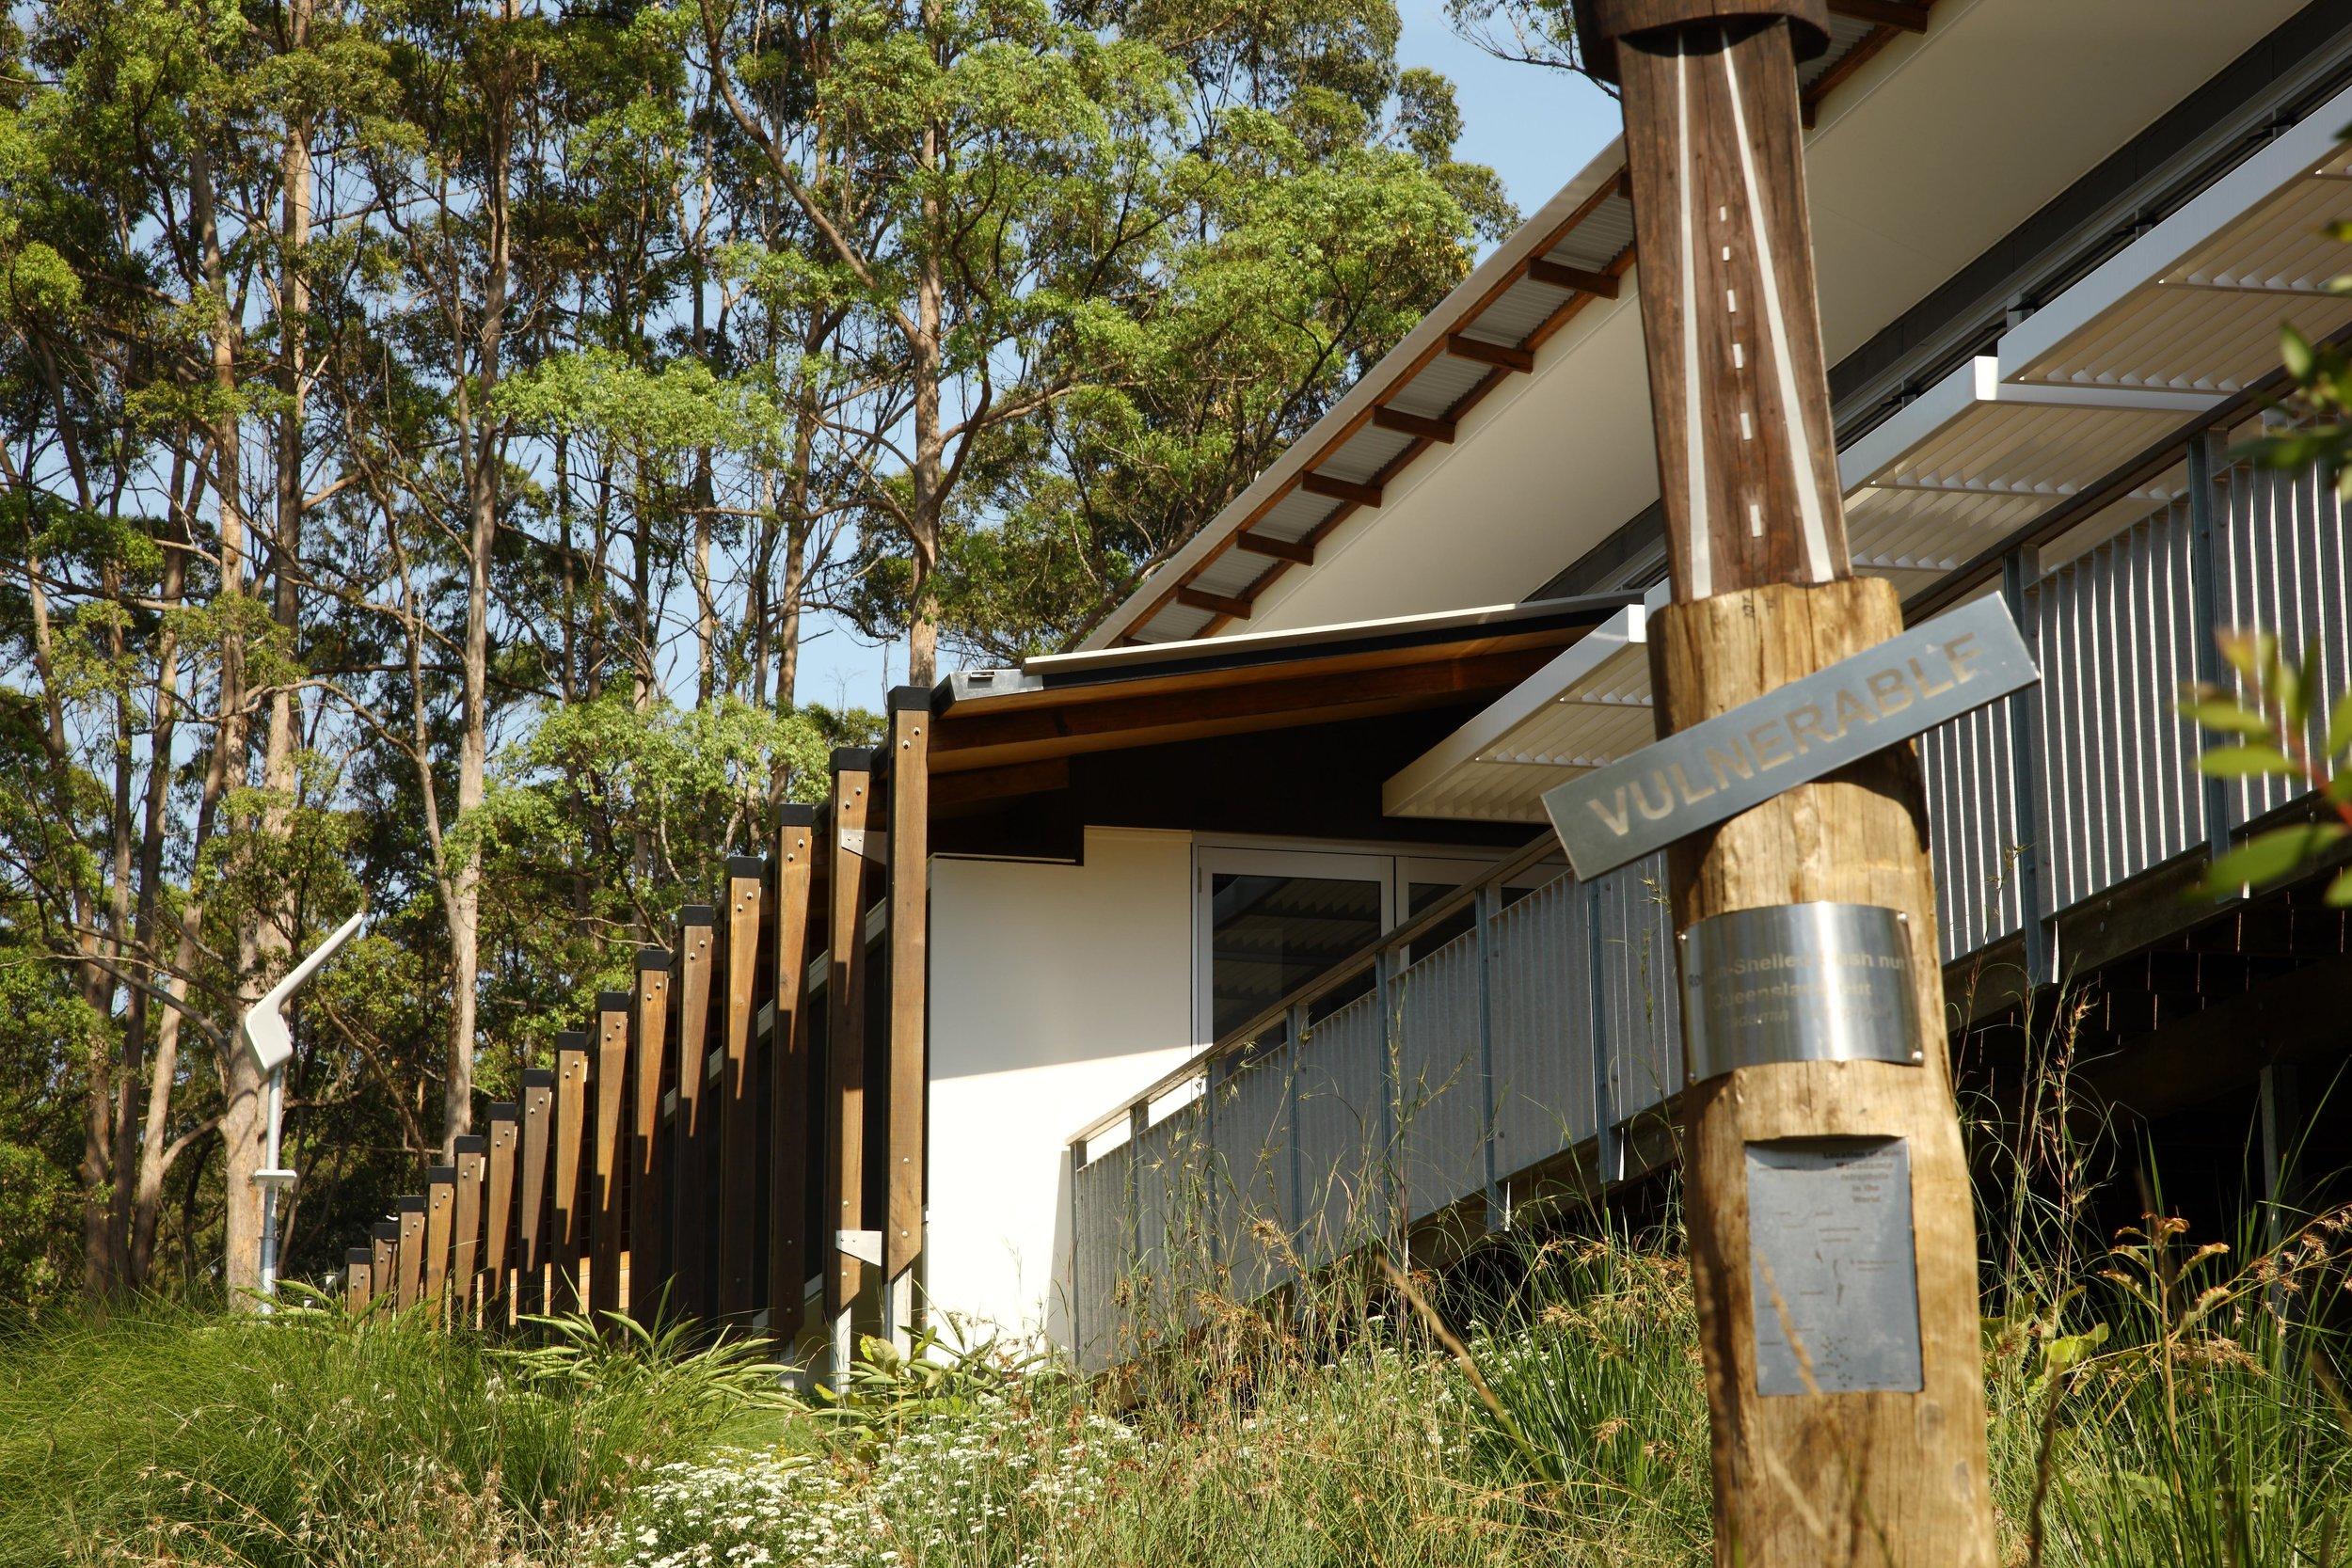 Maroochy-Botanic-Gardens-Guymer-Bailey-Landscape-01.jpg